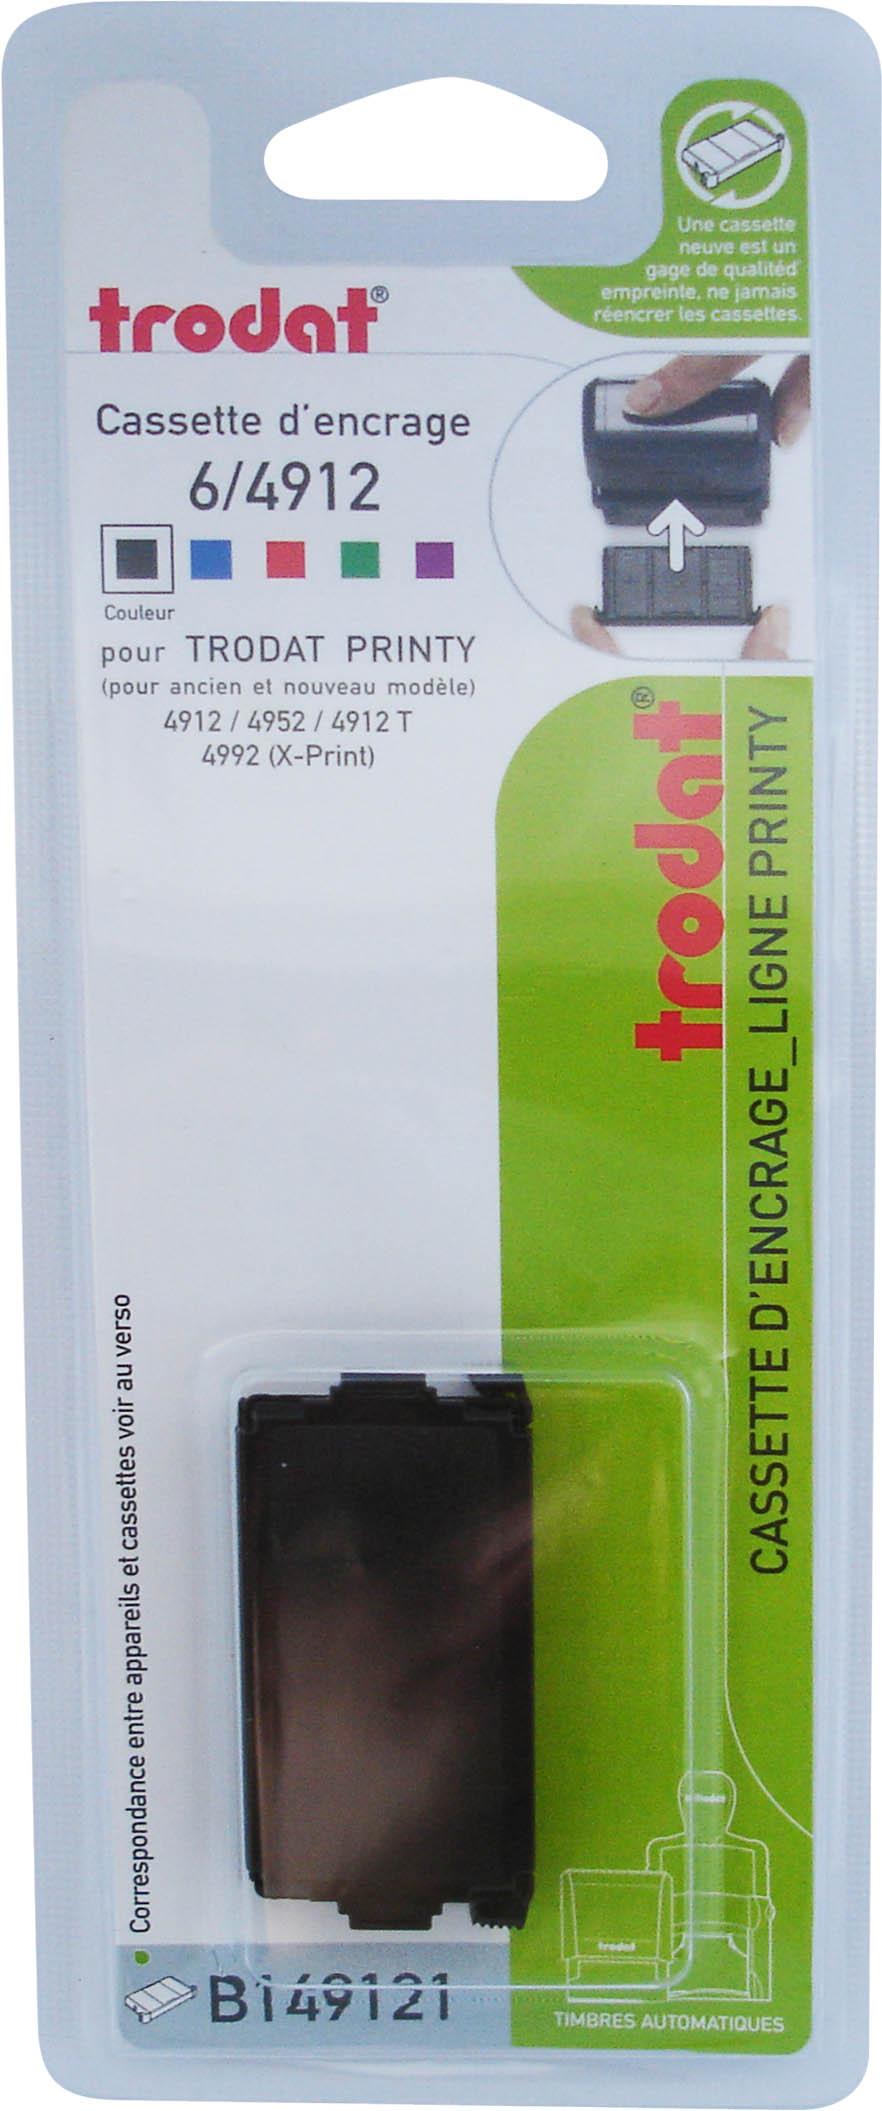 Trodat - Encrier 6/4912 recharge pour tampon Printy 4912/4953 - noir